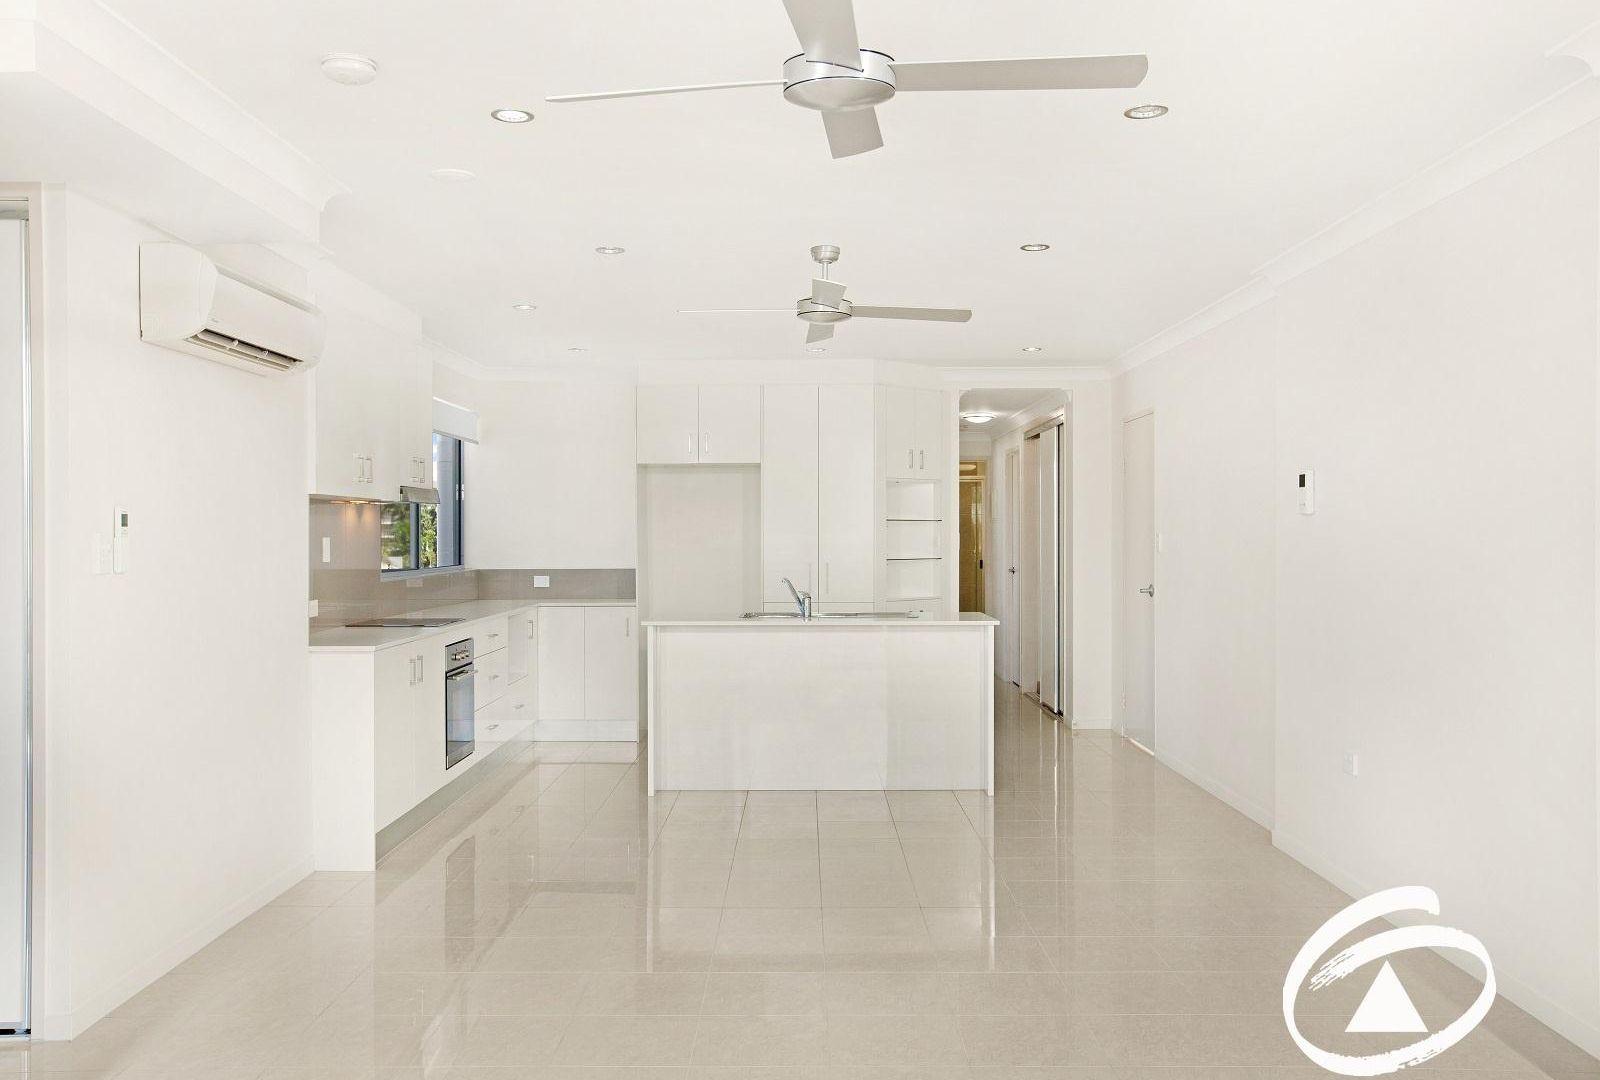 14/146 Grafton Street, Cairns City QLD 4870, Image 1